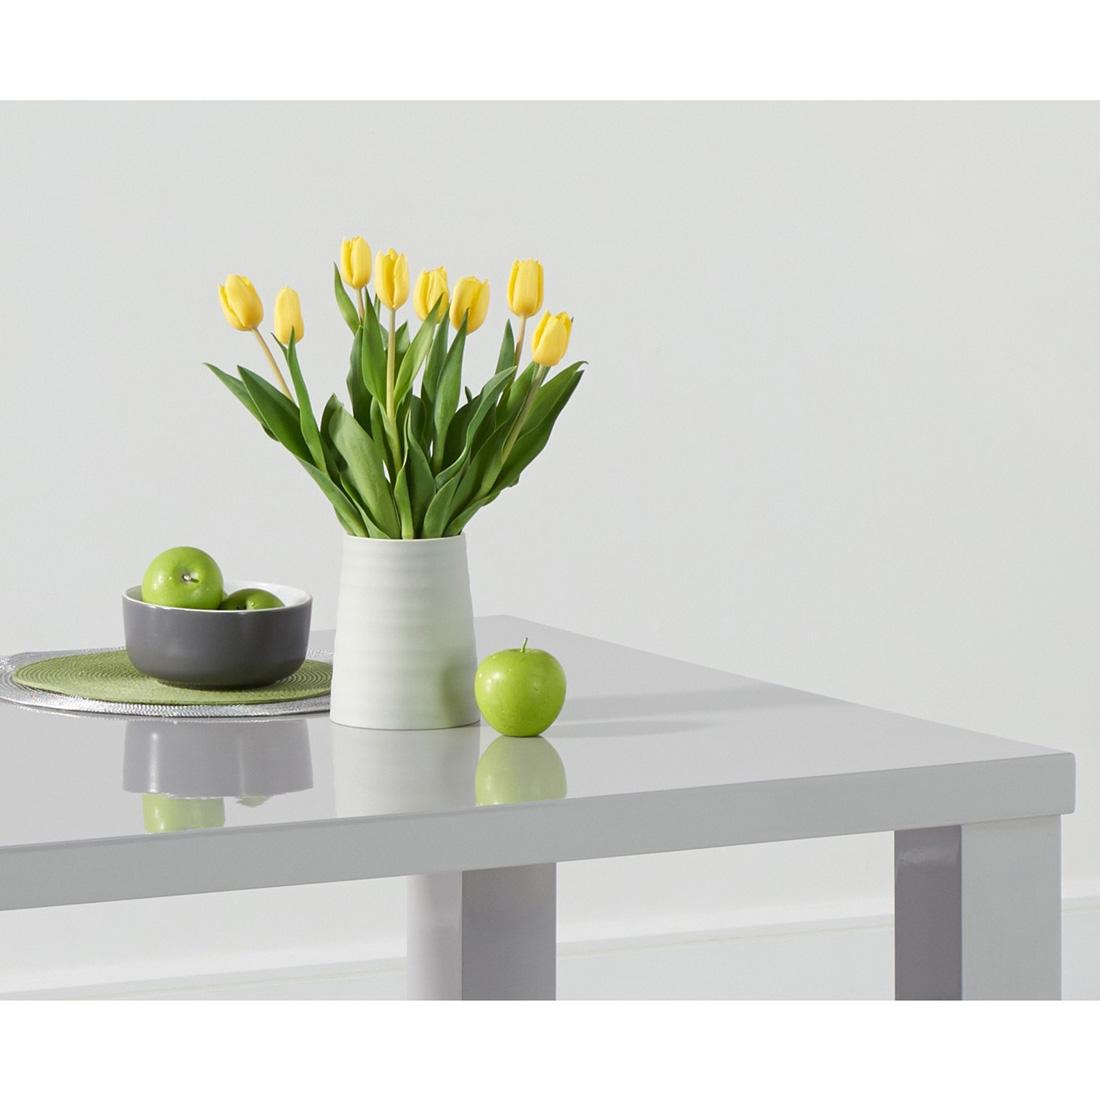 Luna_160cm_light_grey_high_gloss_dining_table_-_pt31604jp_b__1